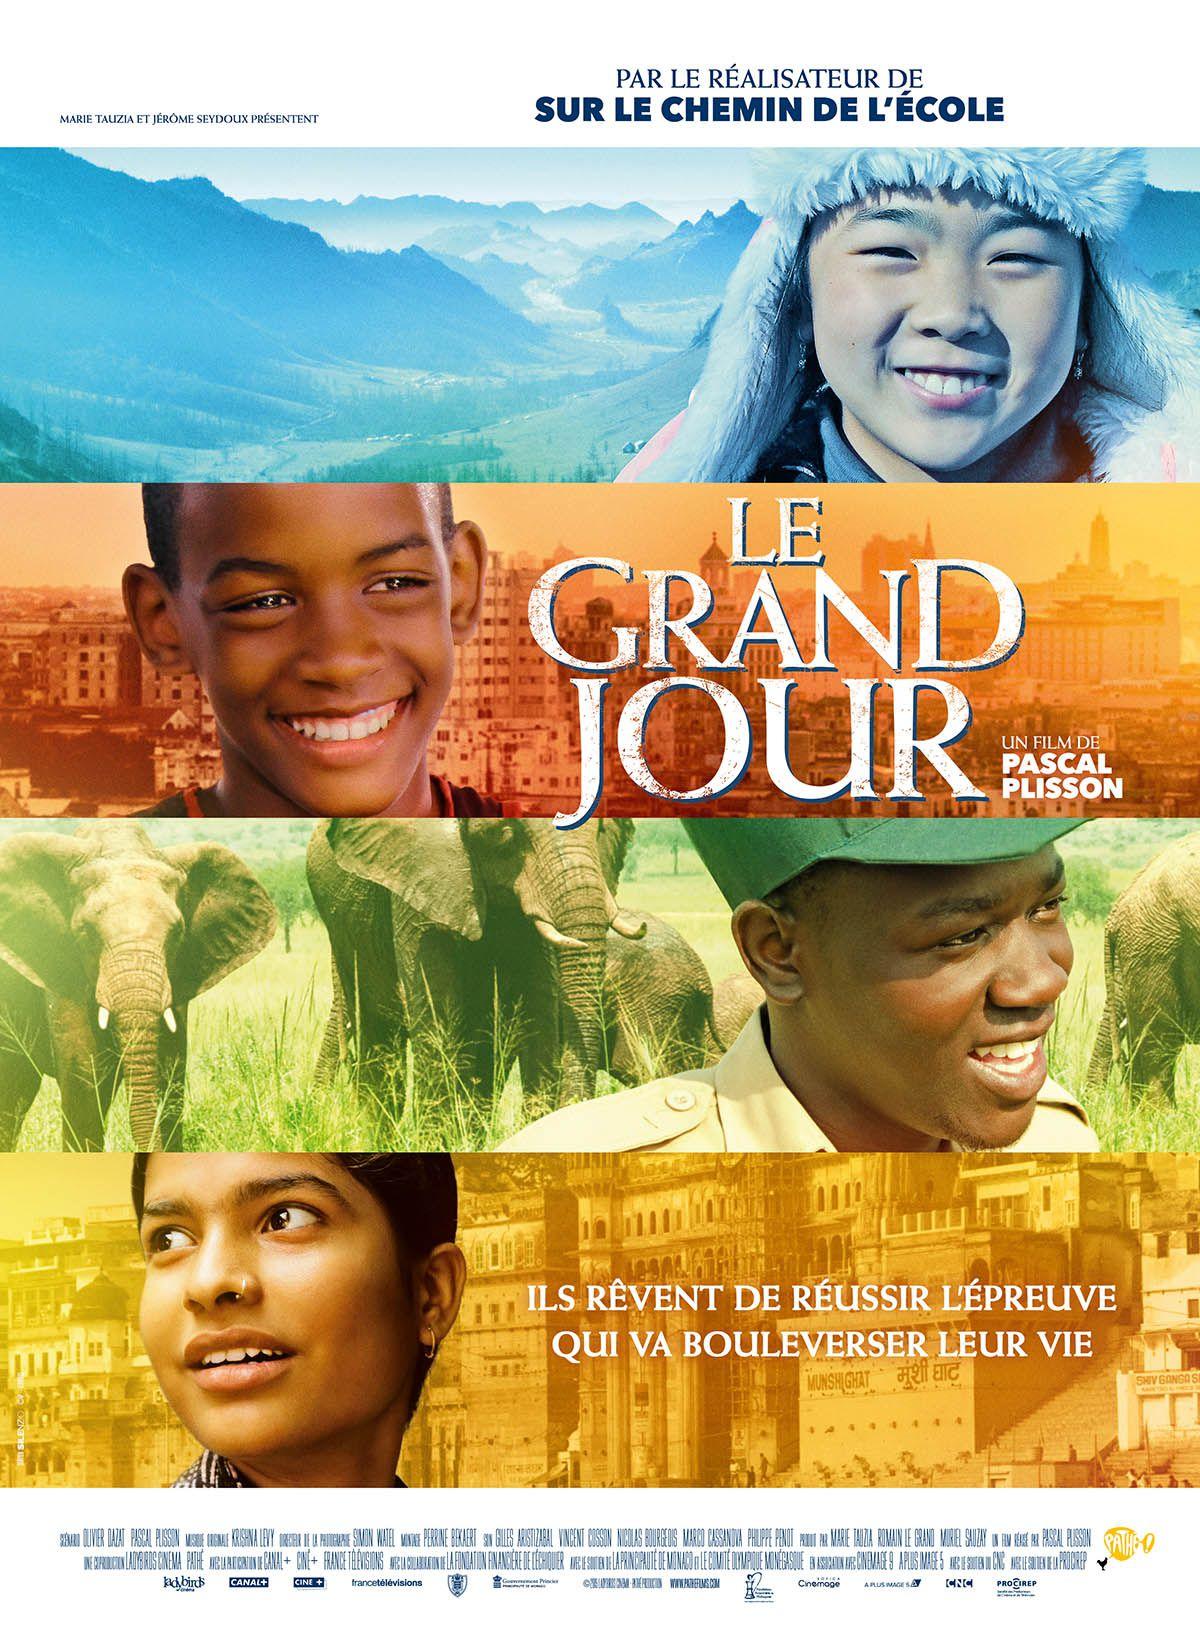 Le grand jour - Film (2015)